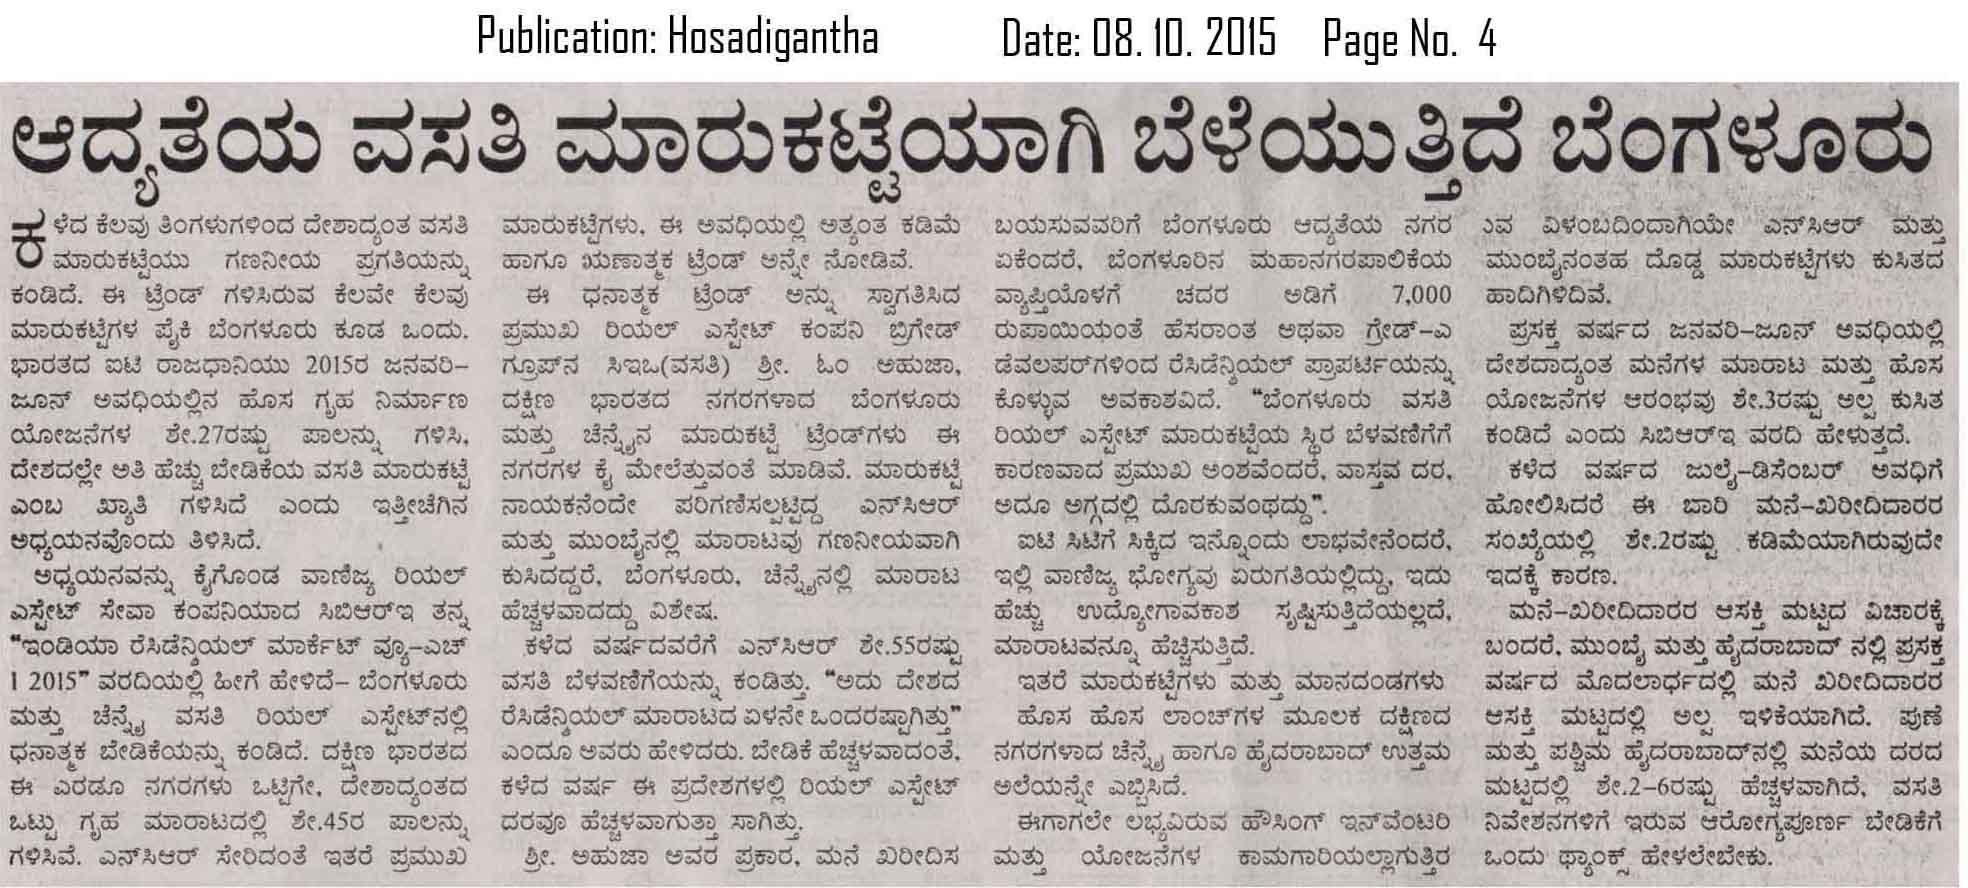 Real estate demand increases in Bangalore - Hosadigantha